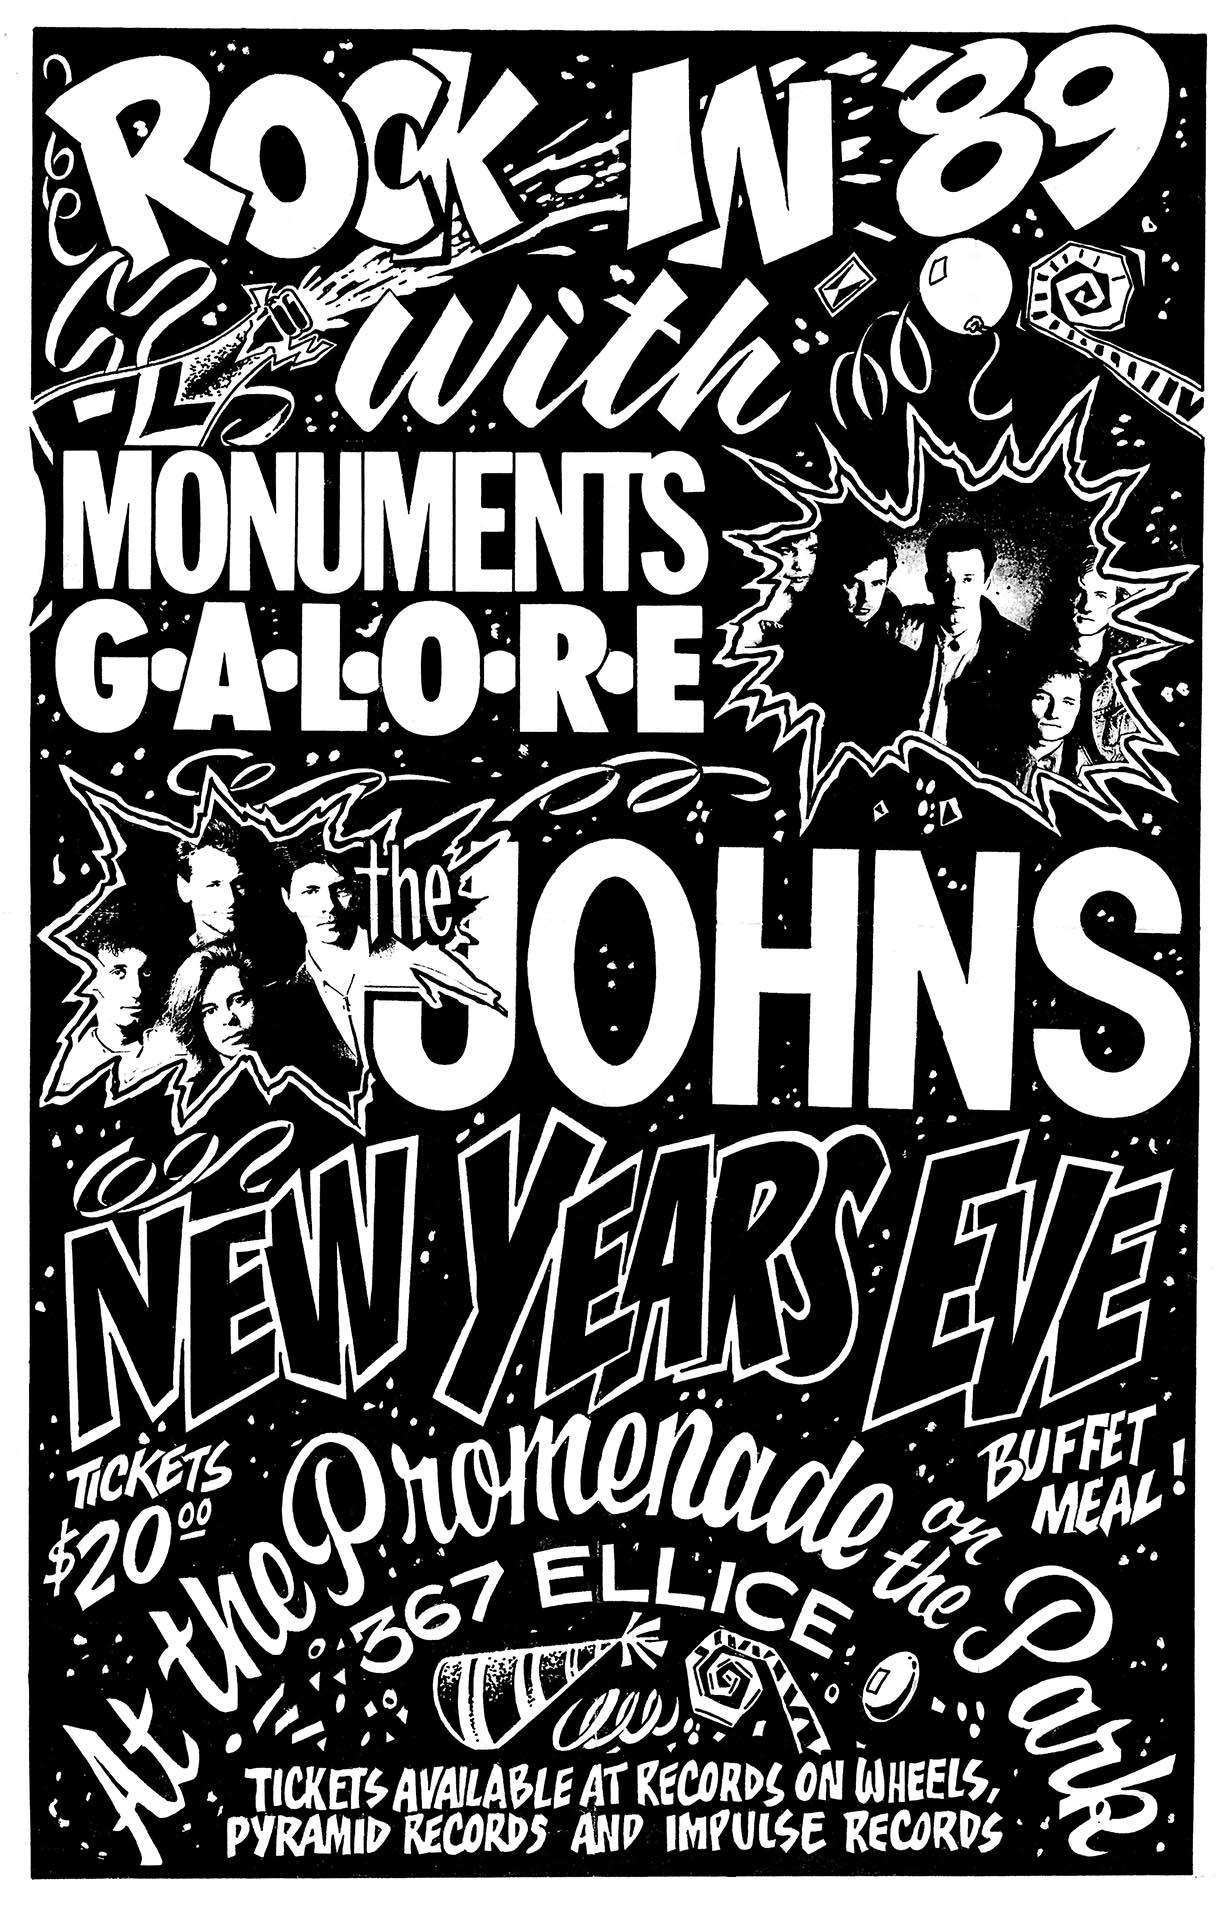 Monuments Galore NYE - 1988